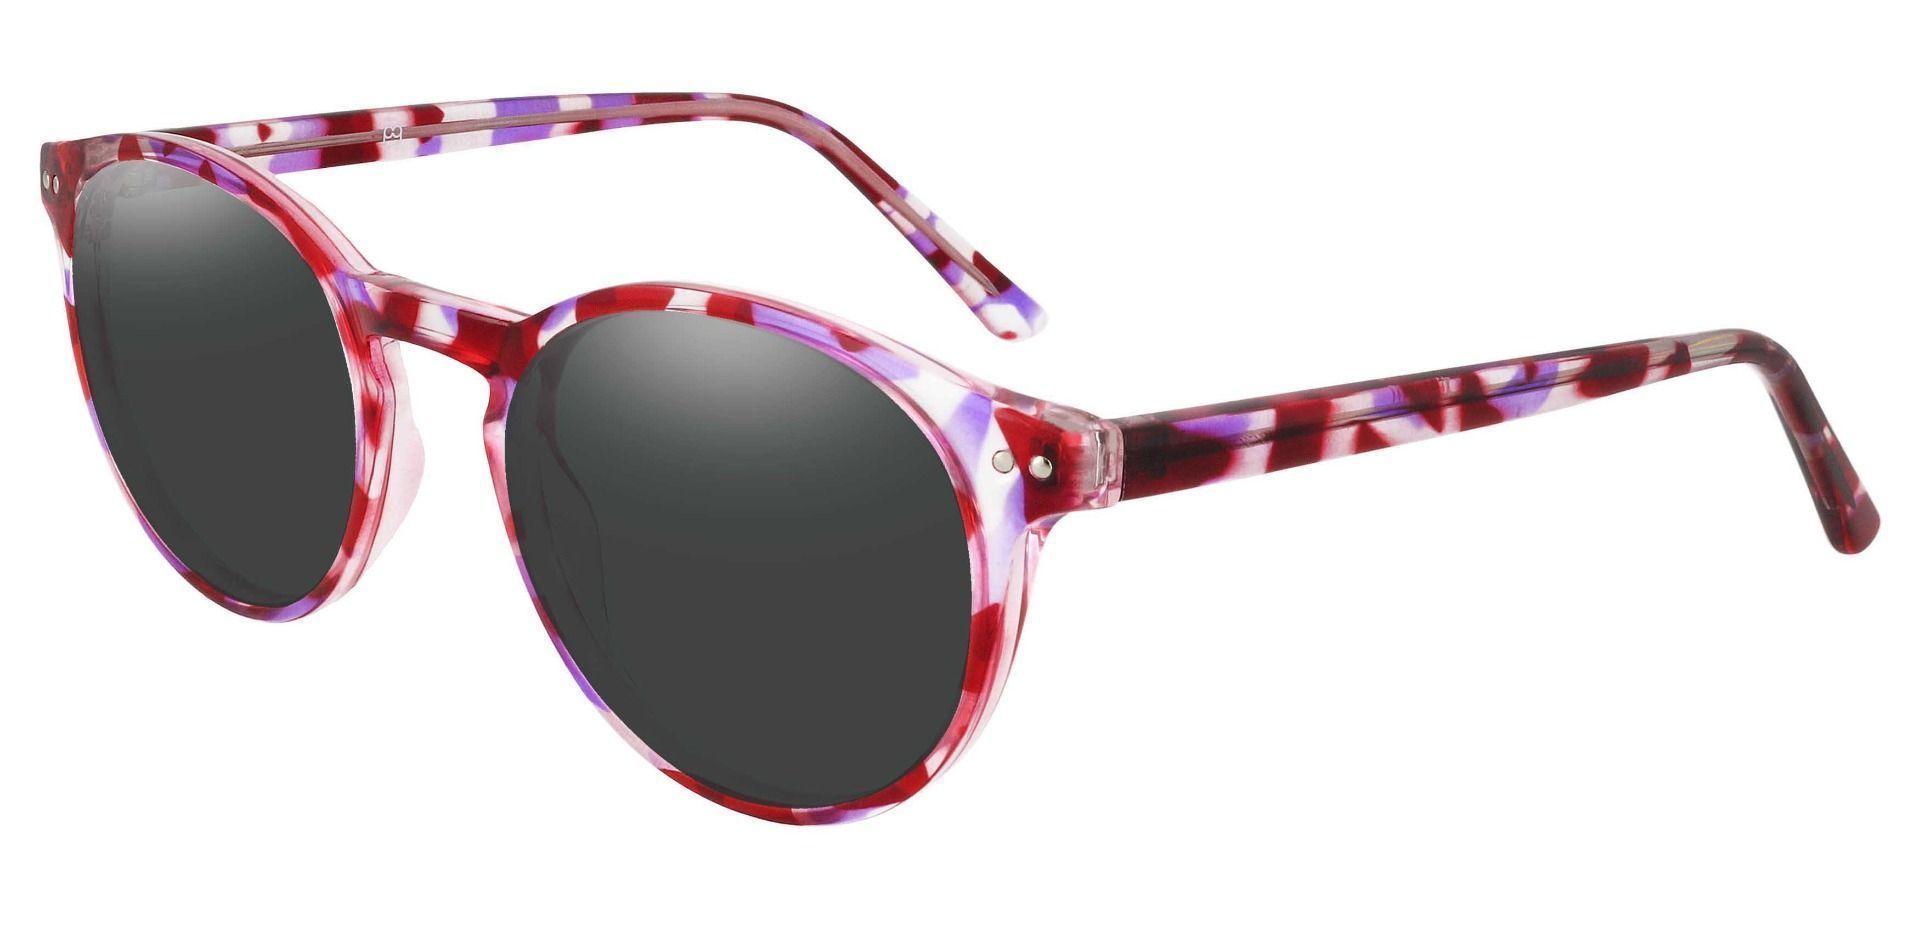 Harmony Oval Prescription Sunglasses - Purple Frame With Gray Lenses